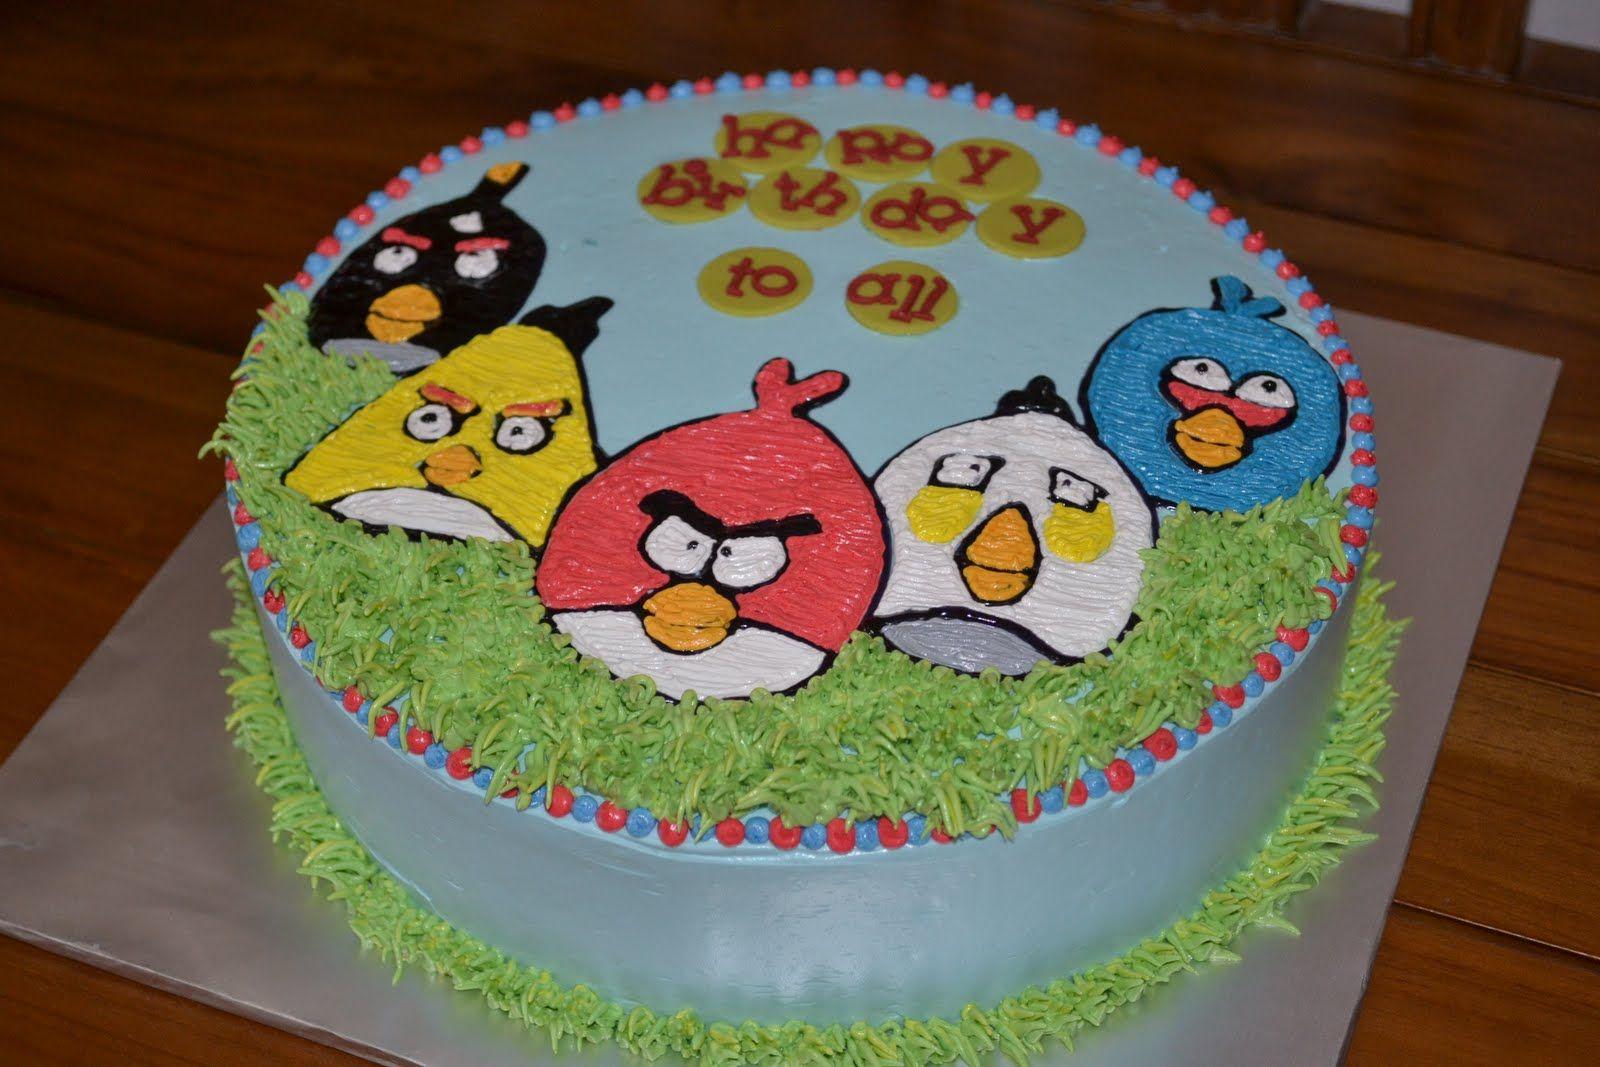 angry bird cakes MyPu3 Cake House Angry Birds cake Angry Birds